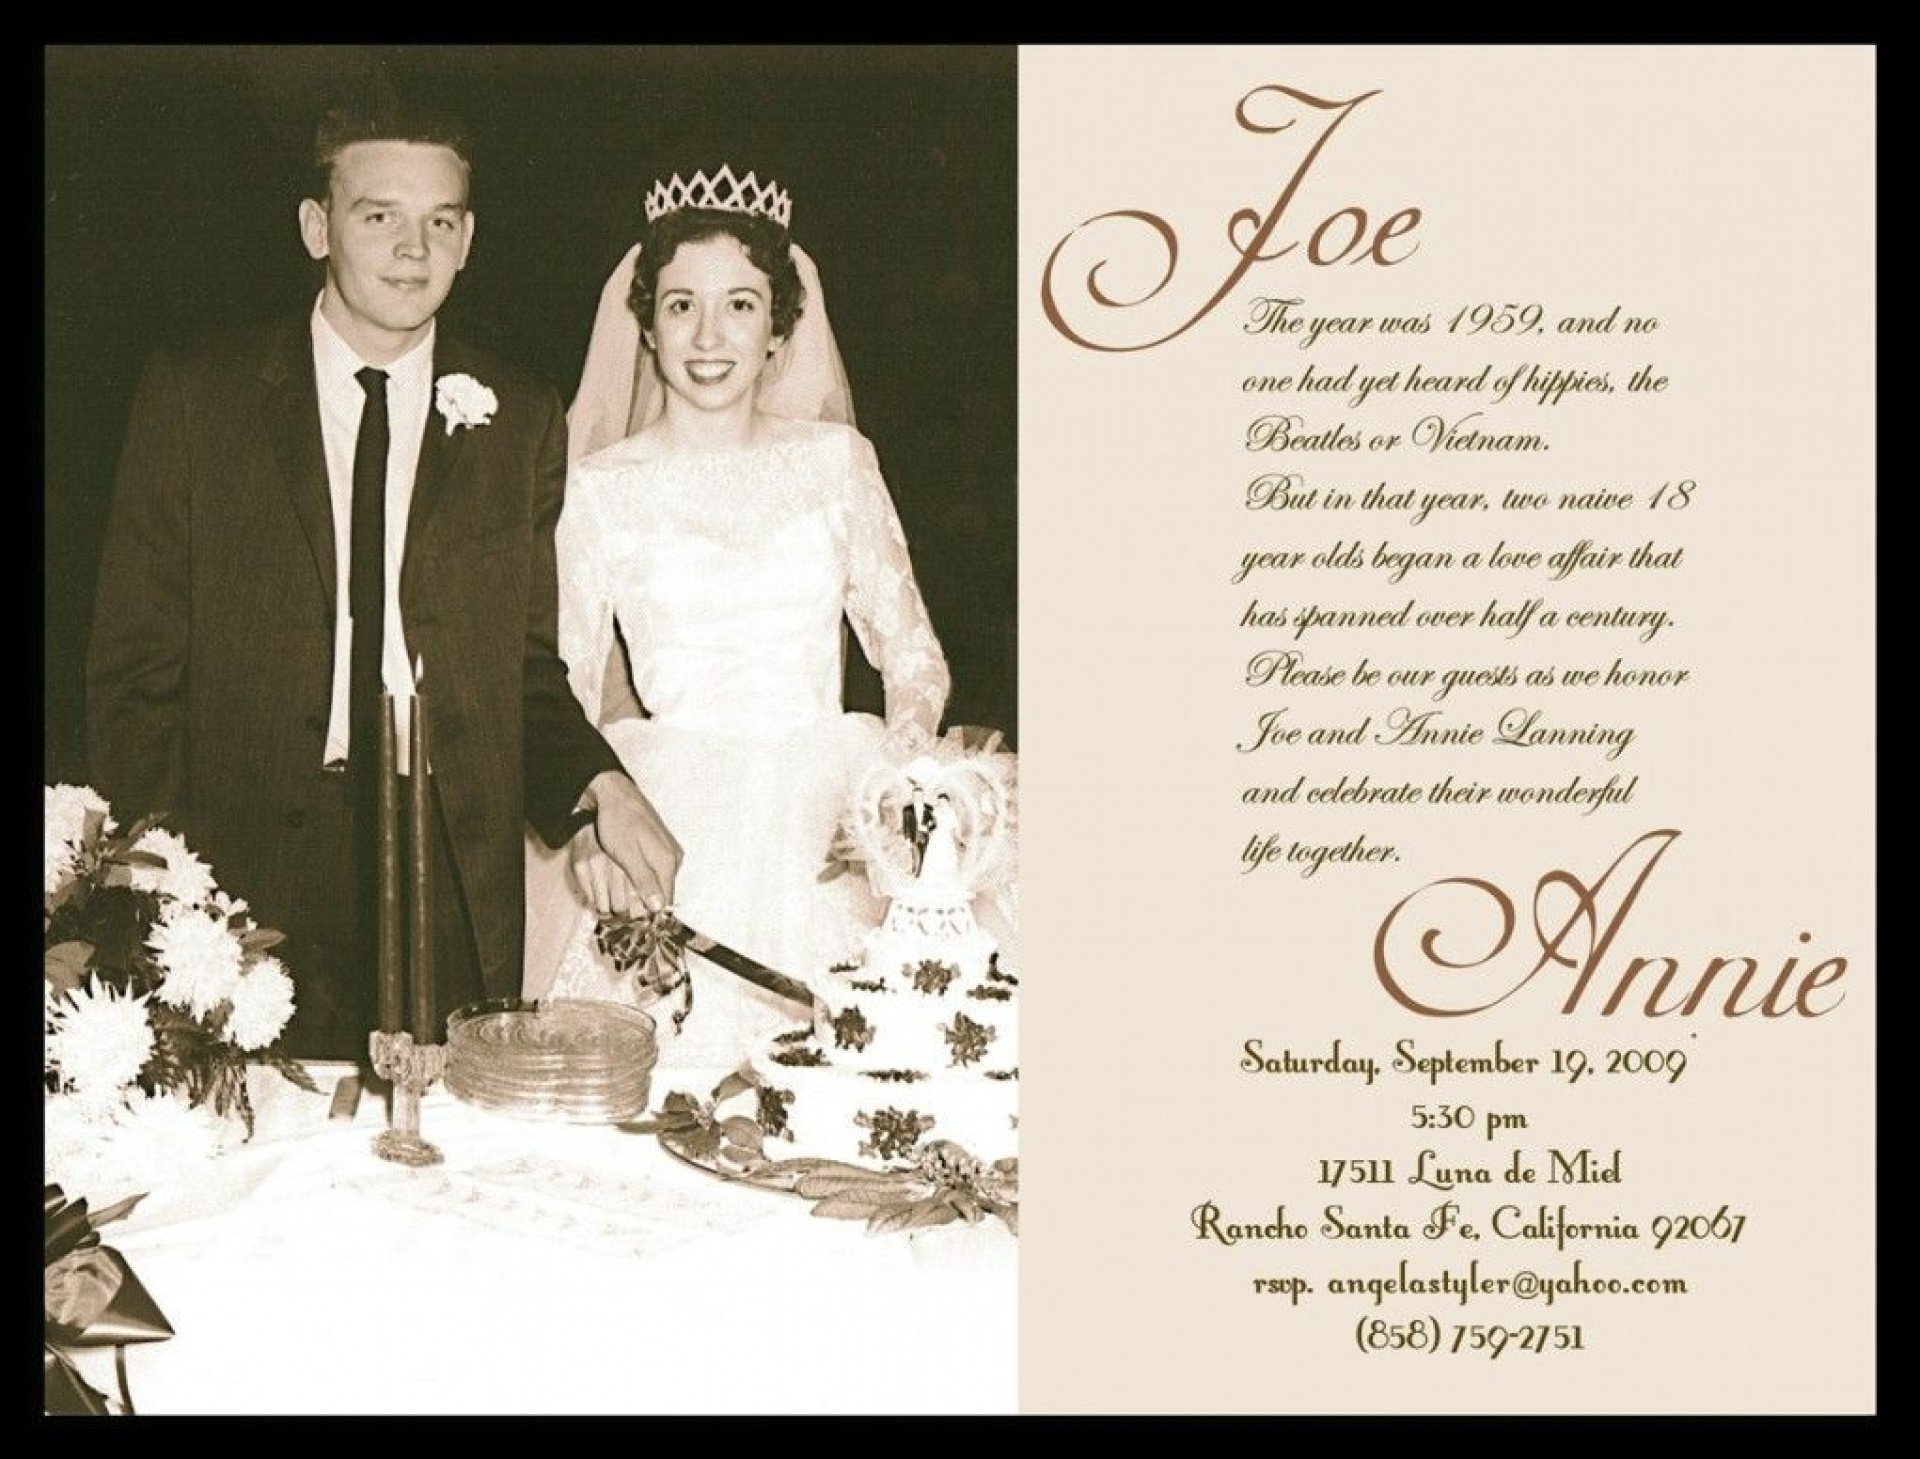 006 Dreaded 50th Wedding Anniversary Invitation Card Template Design  Templates Sample1920